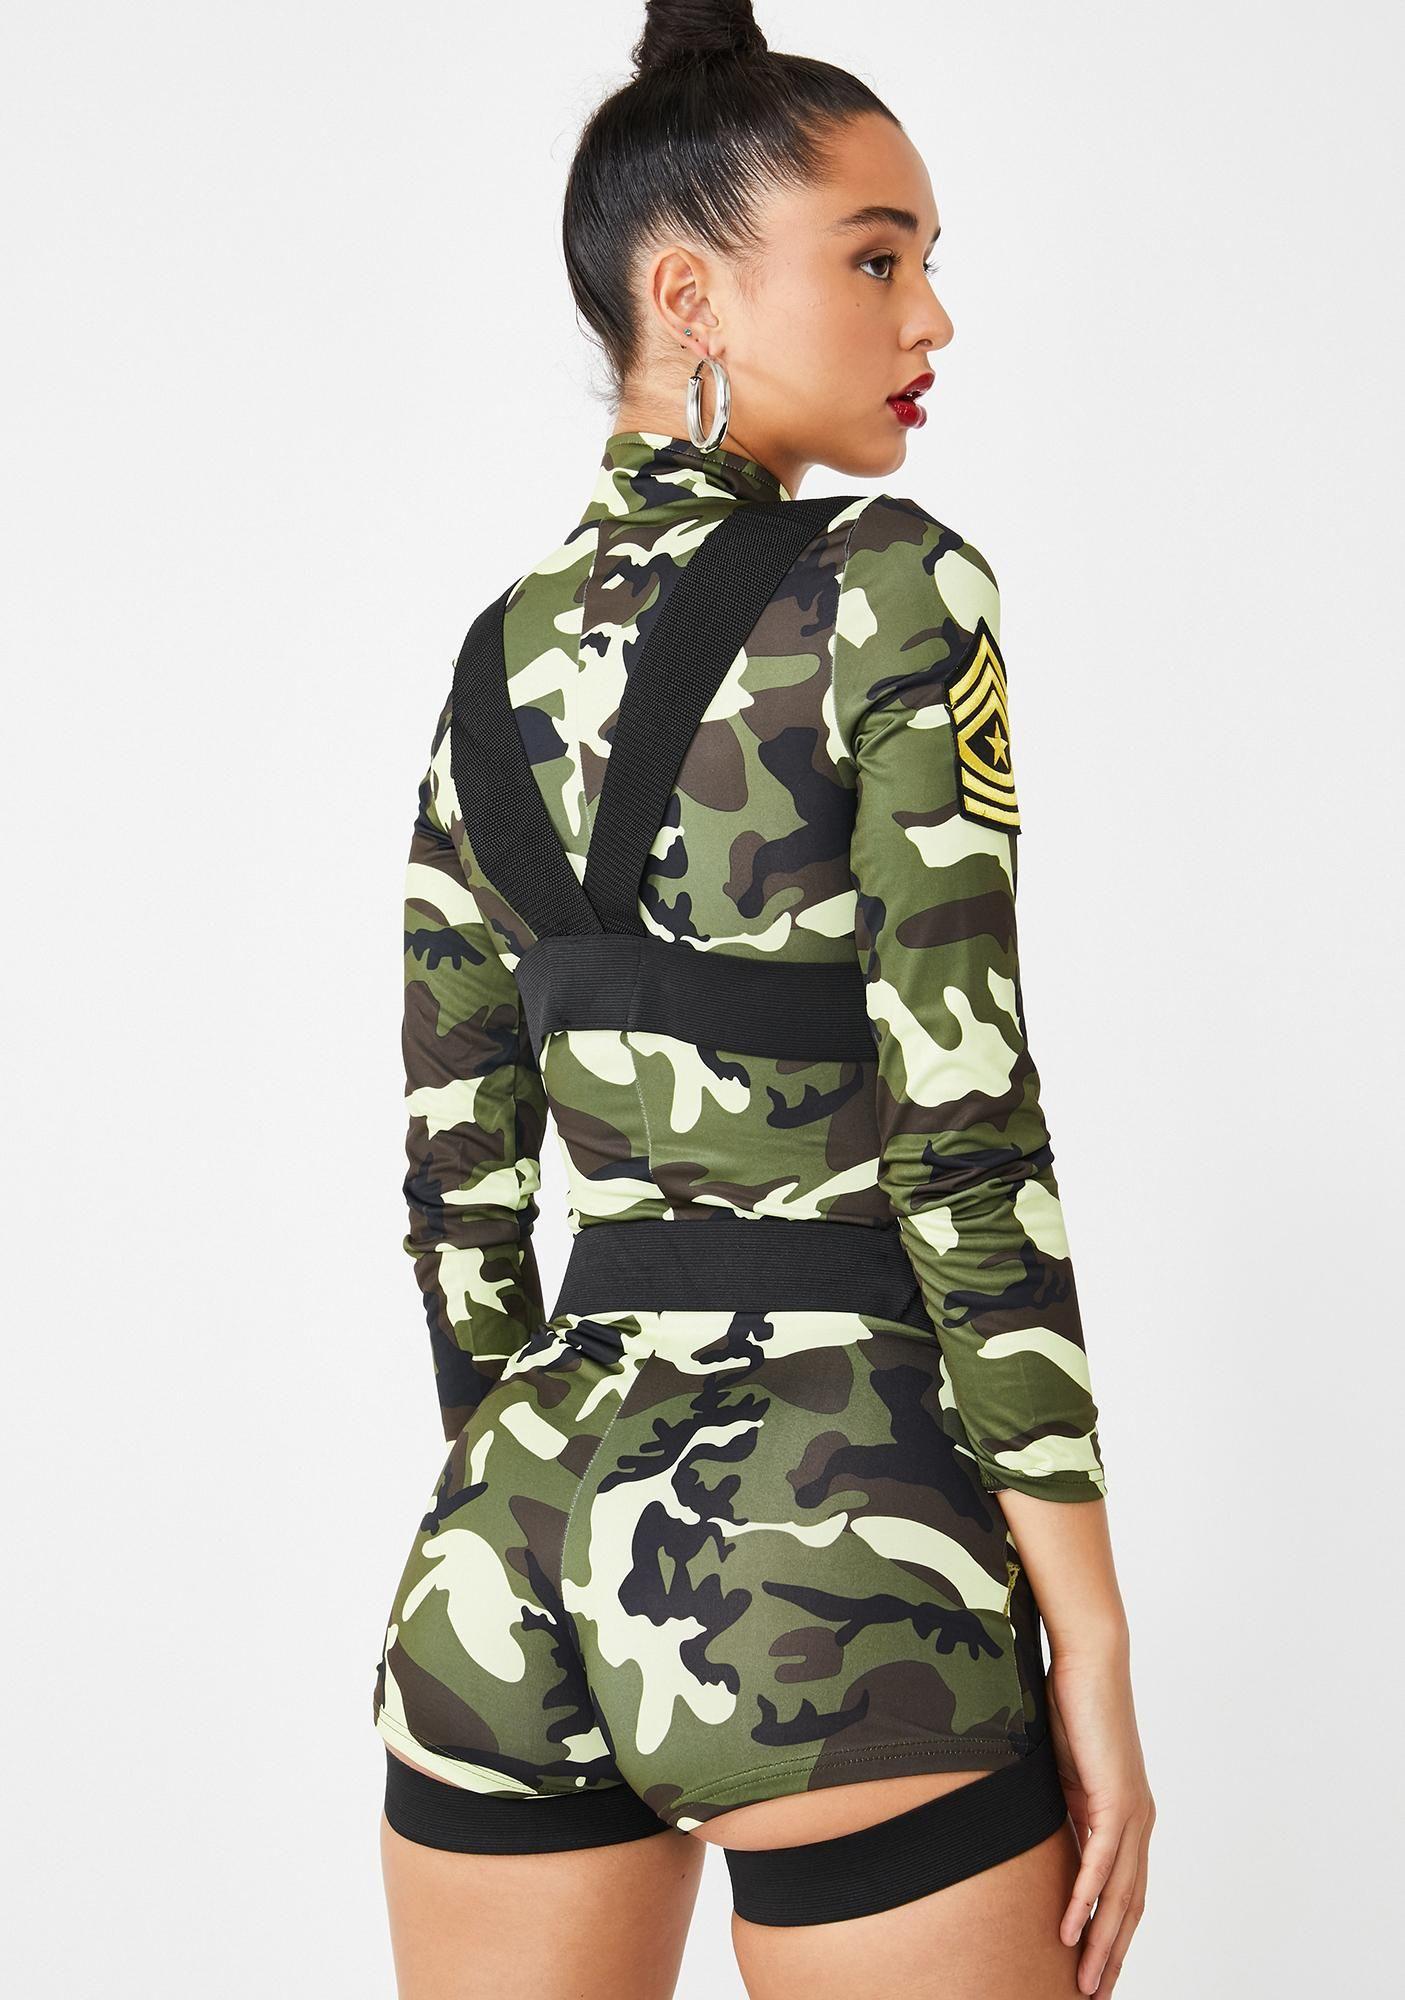 Goin Commando Costume in 2020 Army girl costumes, Punk